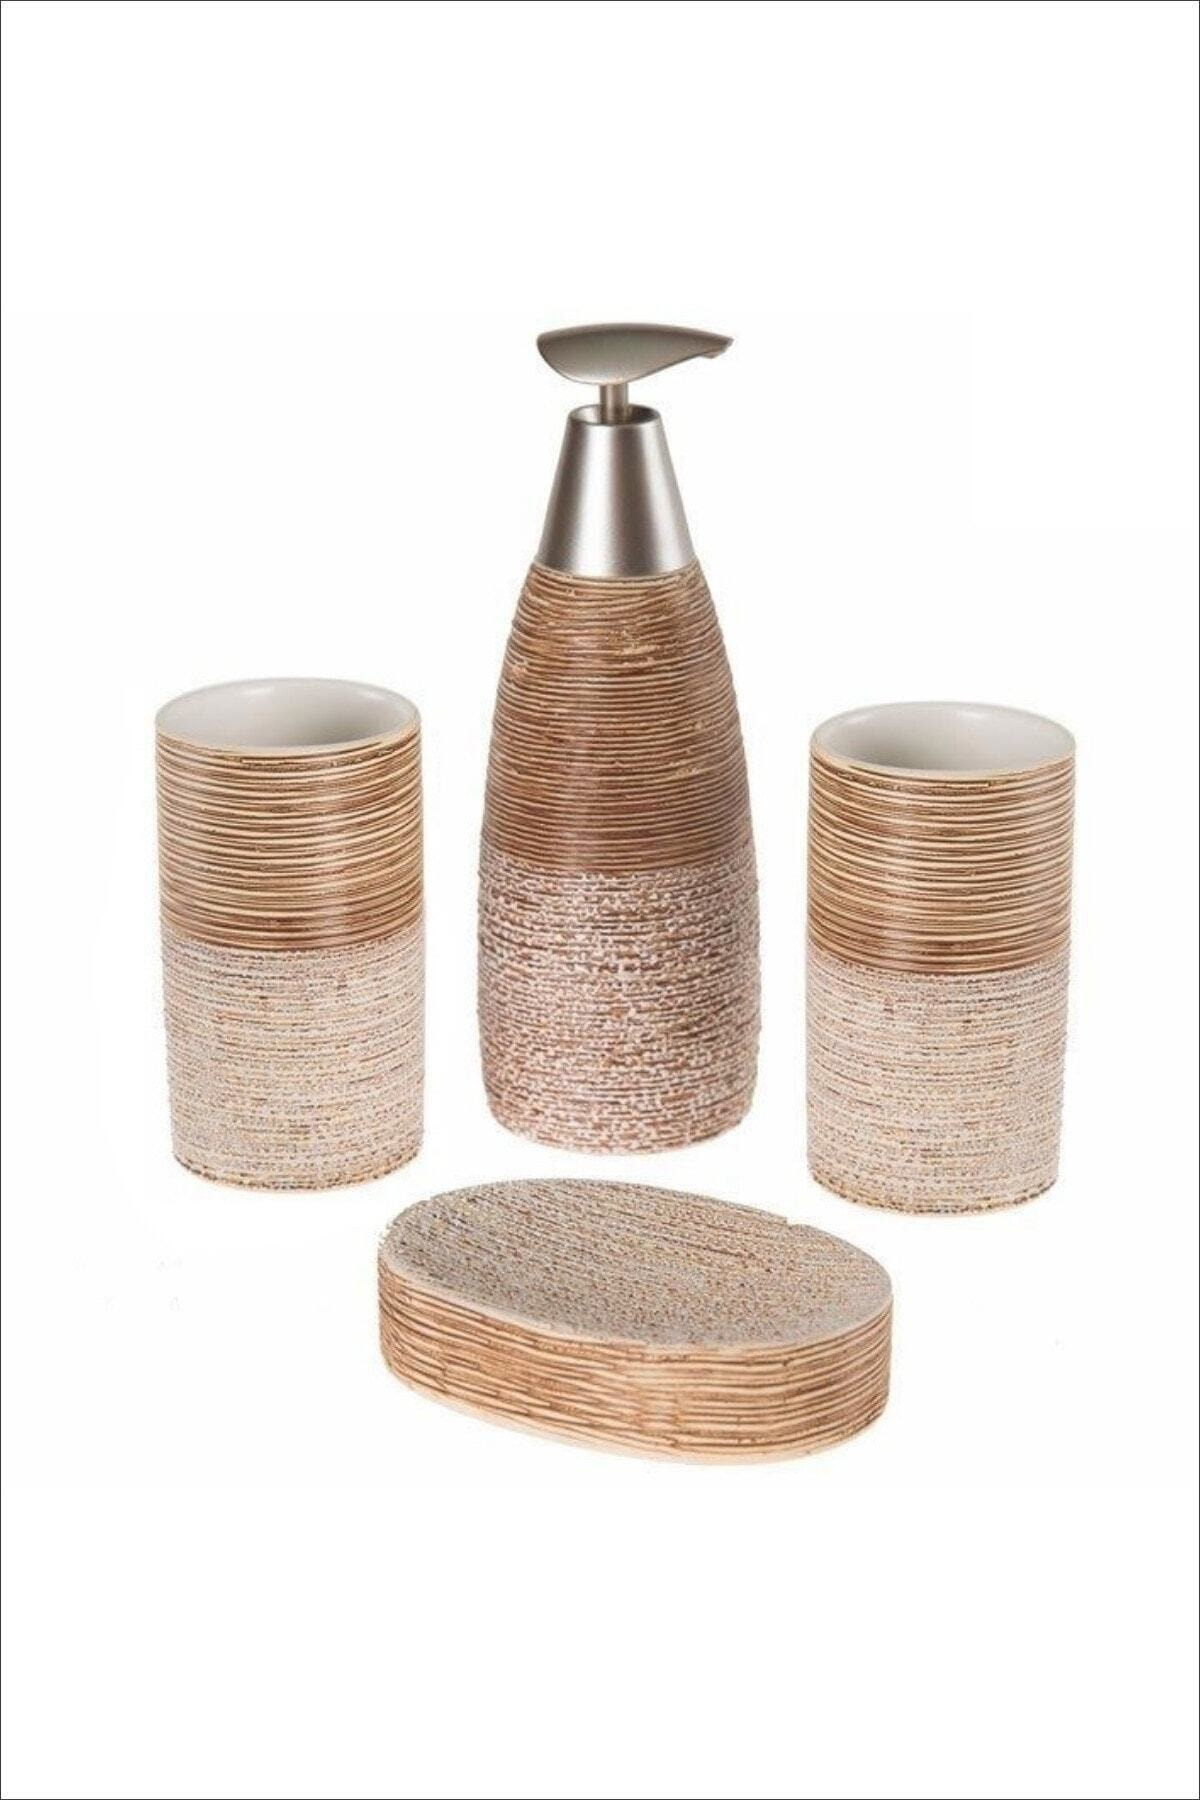 Luxury Ceramic Bathroom Accessory Set 3/4 Piece Marble Soap Dispenser Pump Bottle Couple Mouthwash Cup Dish Washing Tools